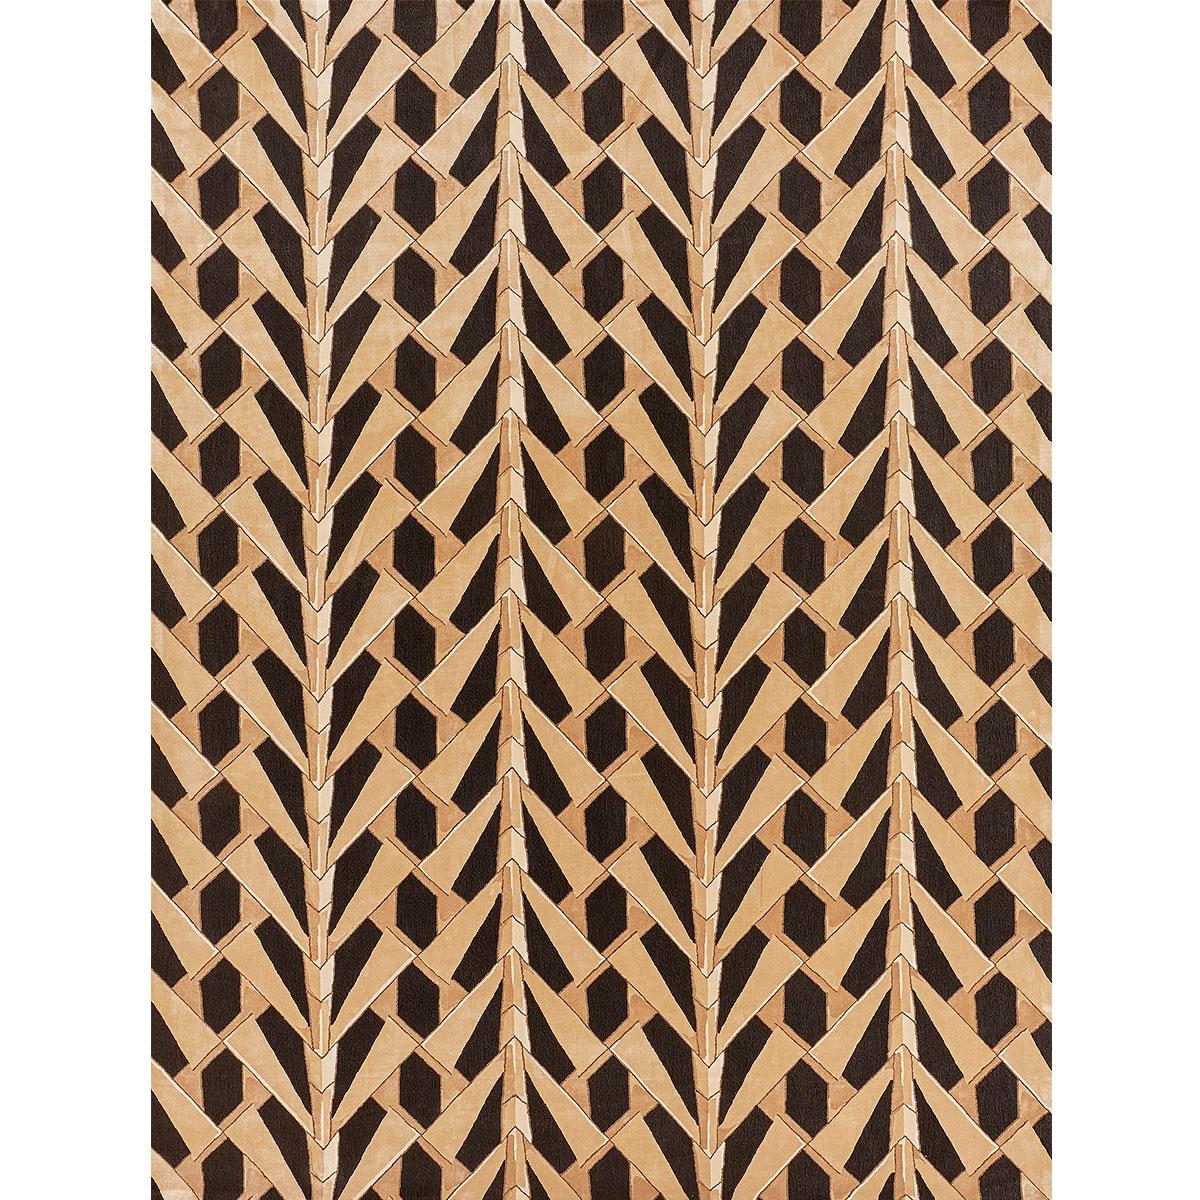 deco-bamboo_wool-silk_hand-tufted_patterson-flynn-martin_pfm